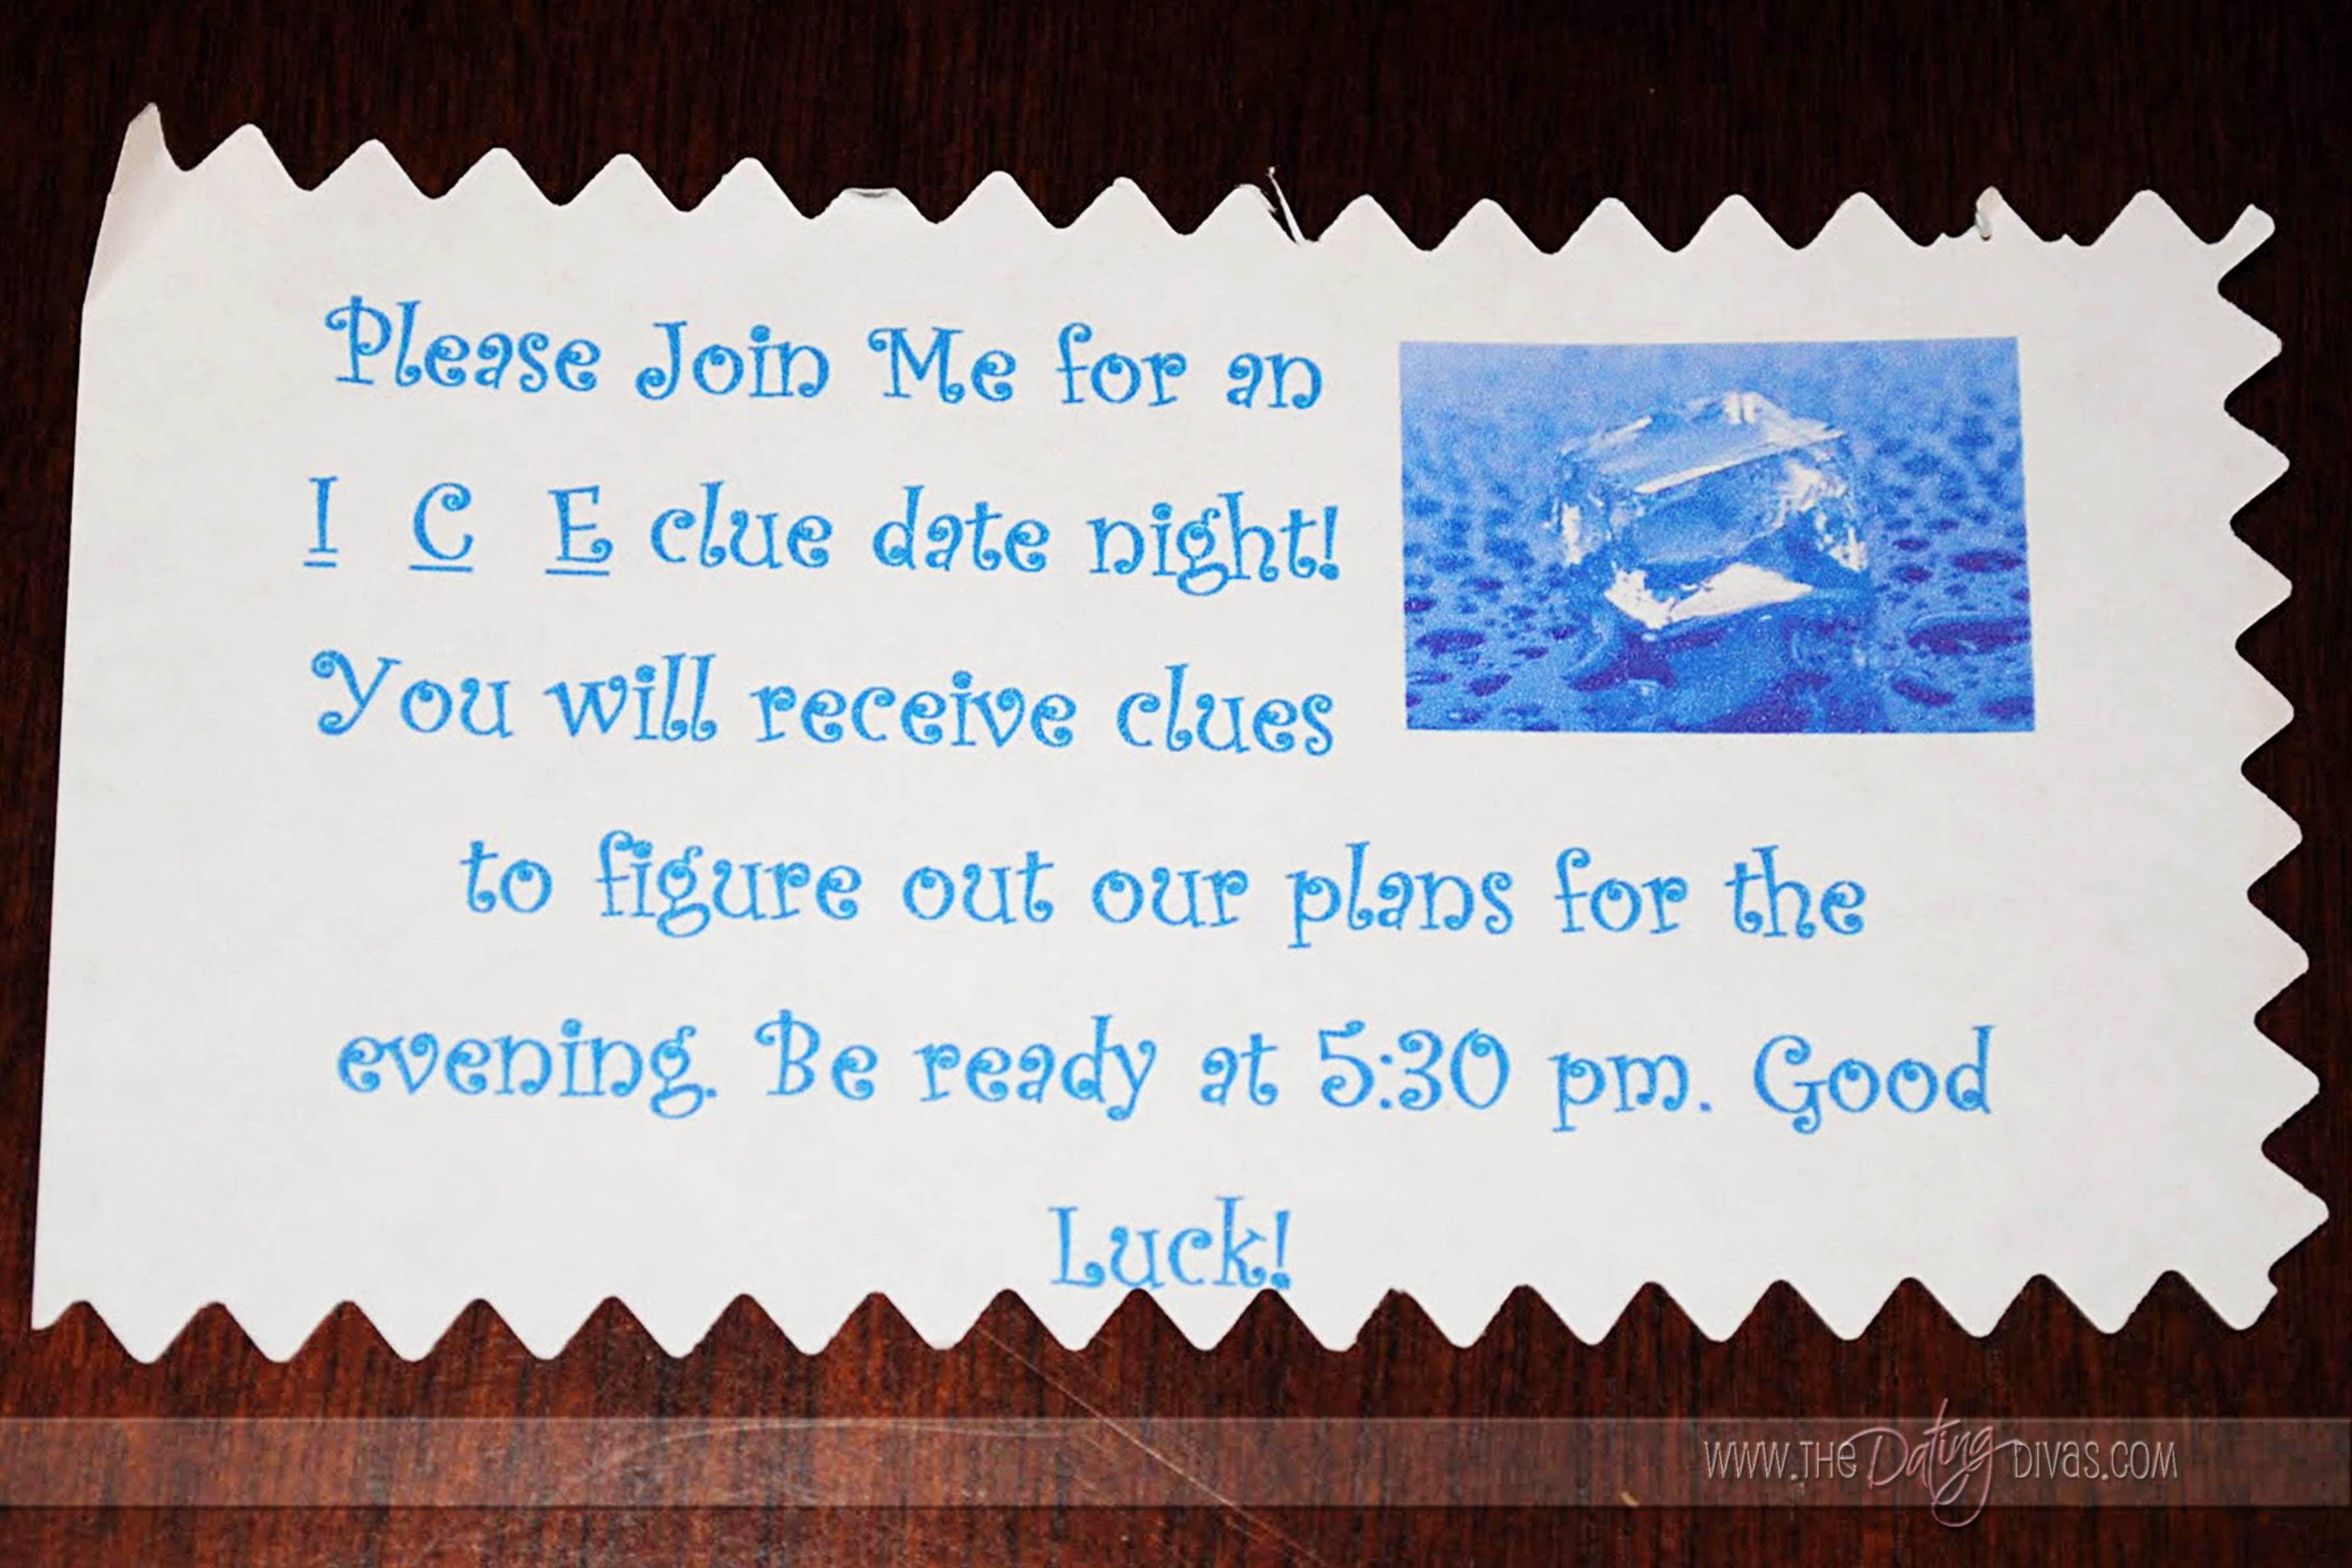 ice clues date night